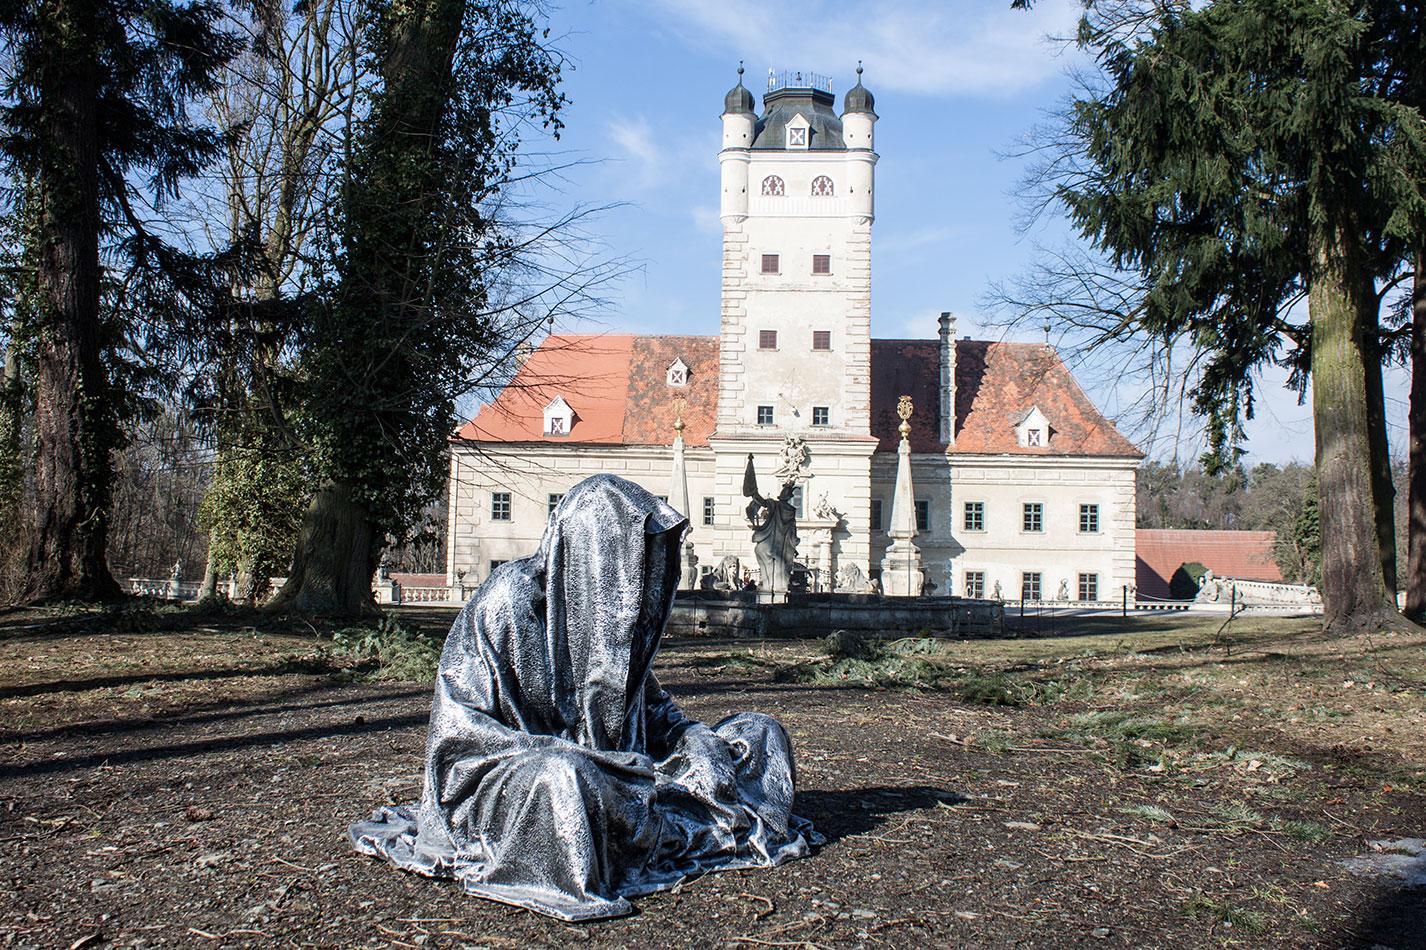 castle-schloss-greilenstein-lower-austriar-waldviertel-guardians-of-time-contemporary-art-sculpture-design-antique-manfred-kili-kielnhofer-7472